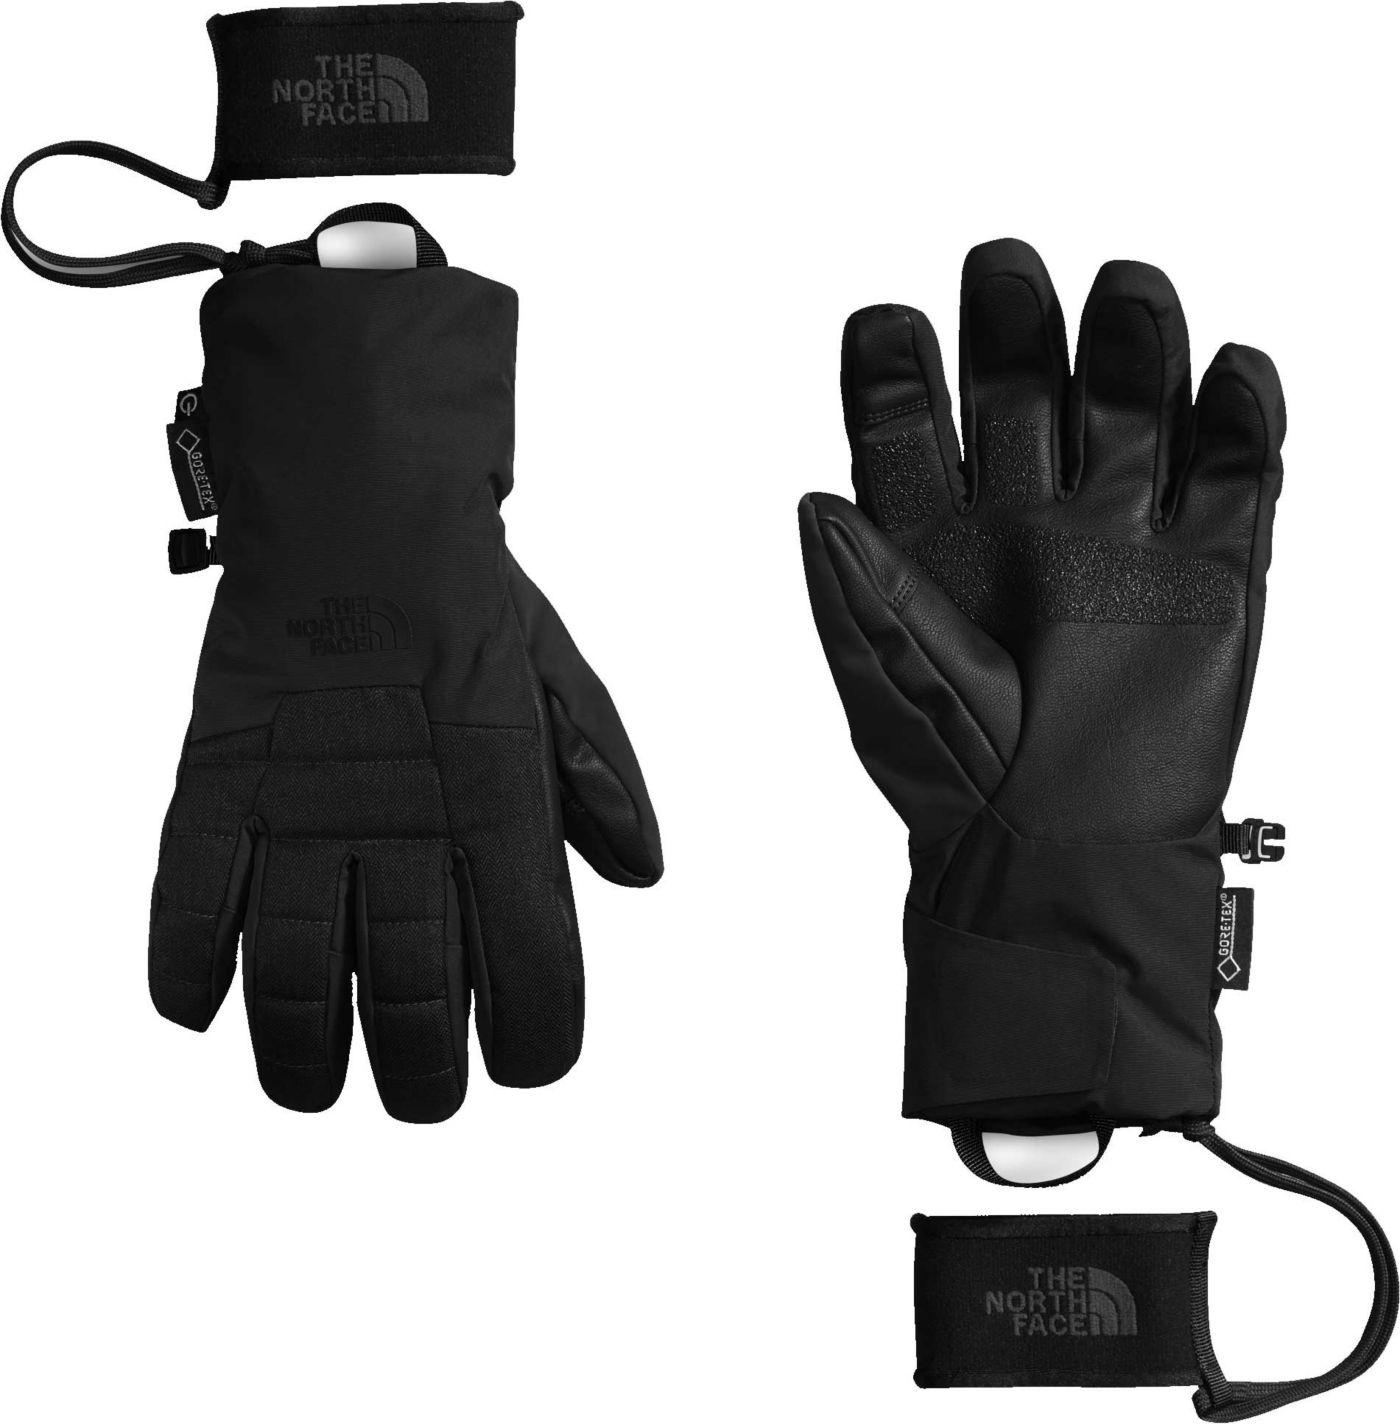 The North Face Men's Montana GORE-TEX SG Gloves